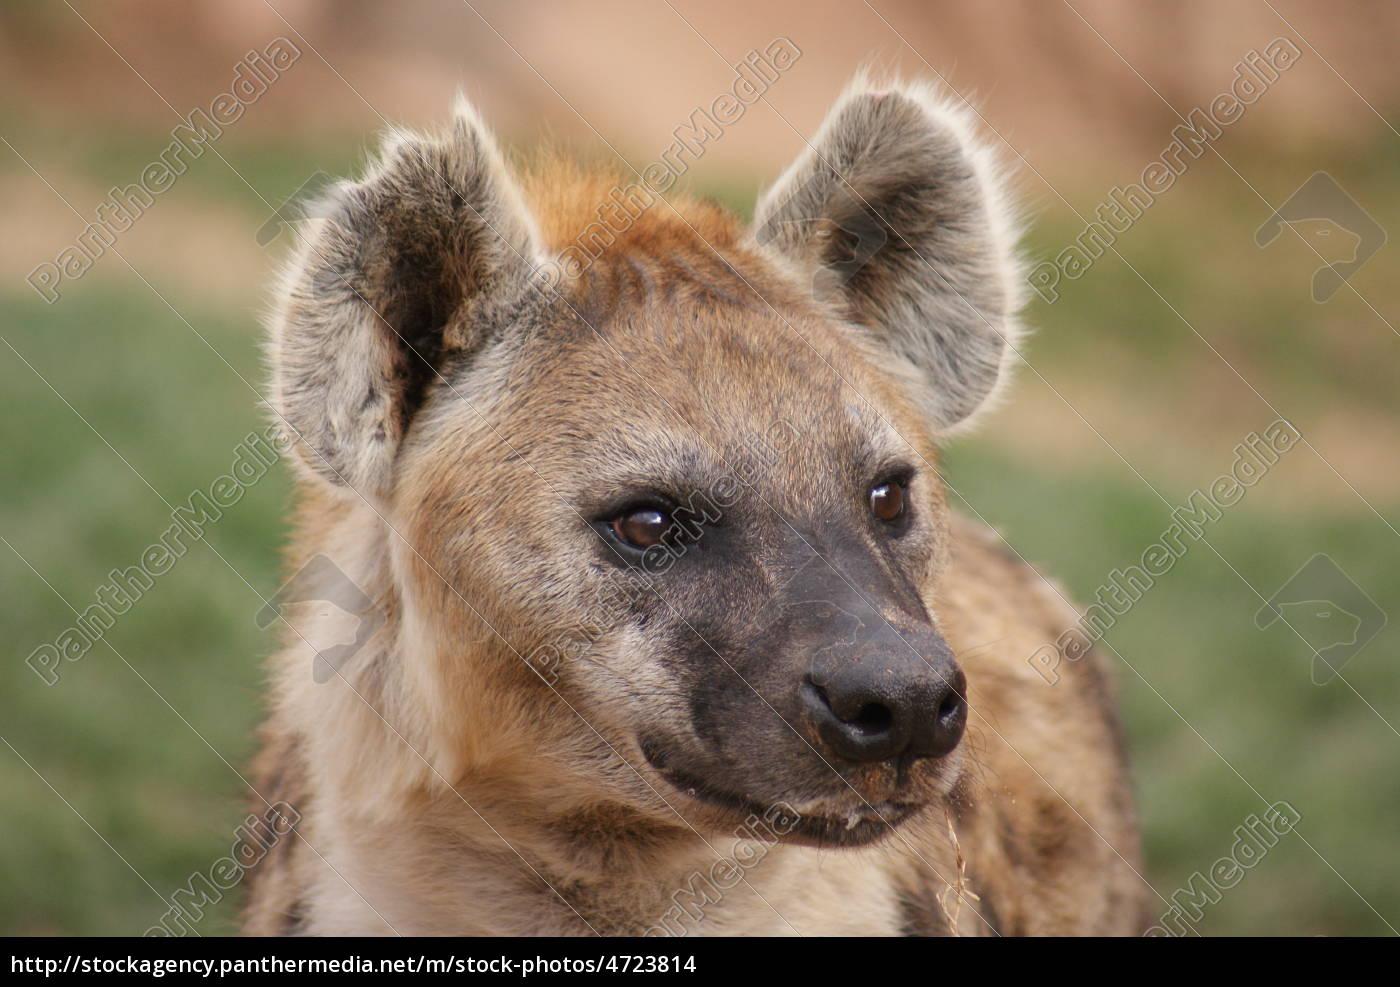 Stockphoto 4723814 - manchado risas hiena crocuta crocuta